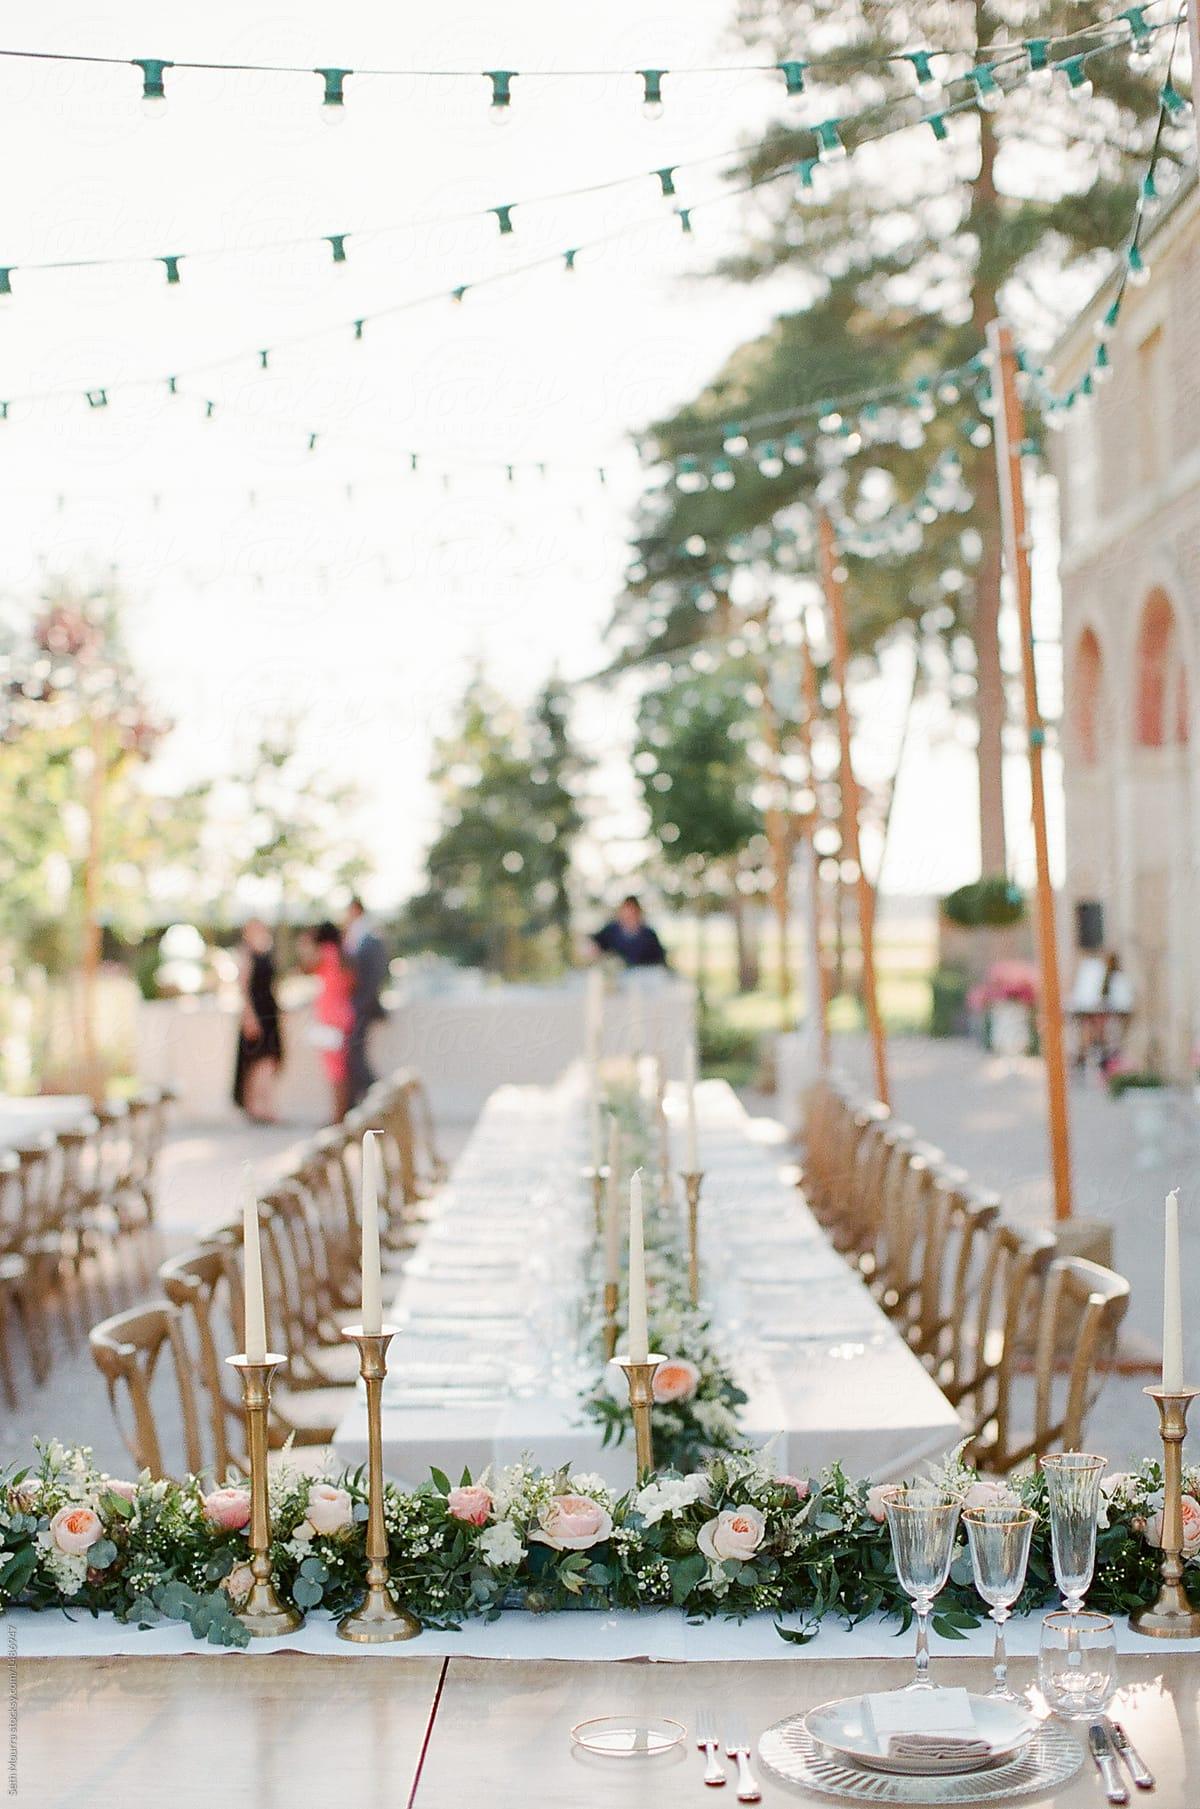 Outdoor Burgundy Wedding Reception by Seth Mourra - Dinner party, Wedding  reception - Stocksy United